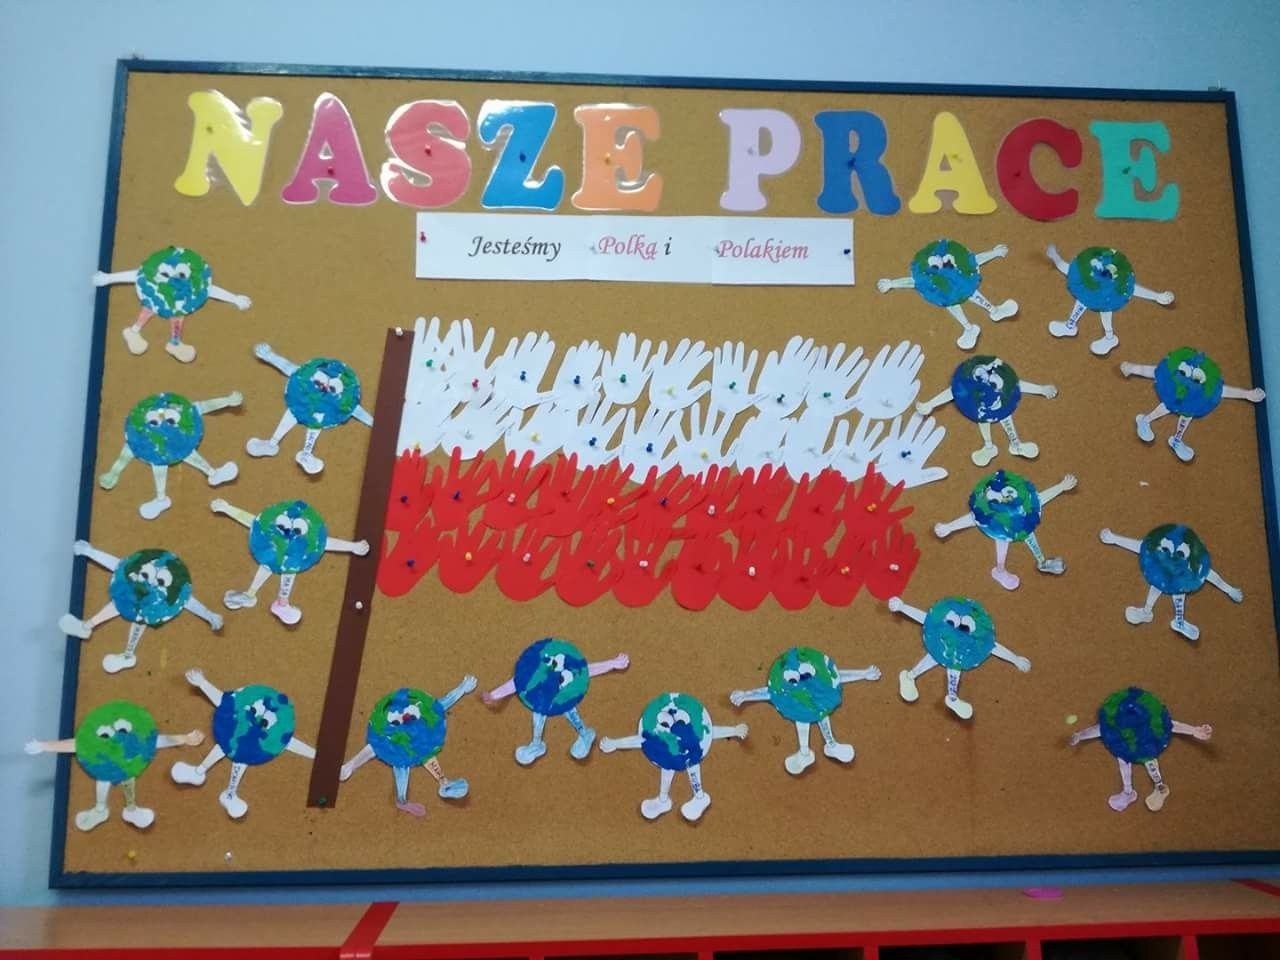 Polska Flaga Z Rak Dzien Ziemi Art Activities For Kids Swieto